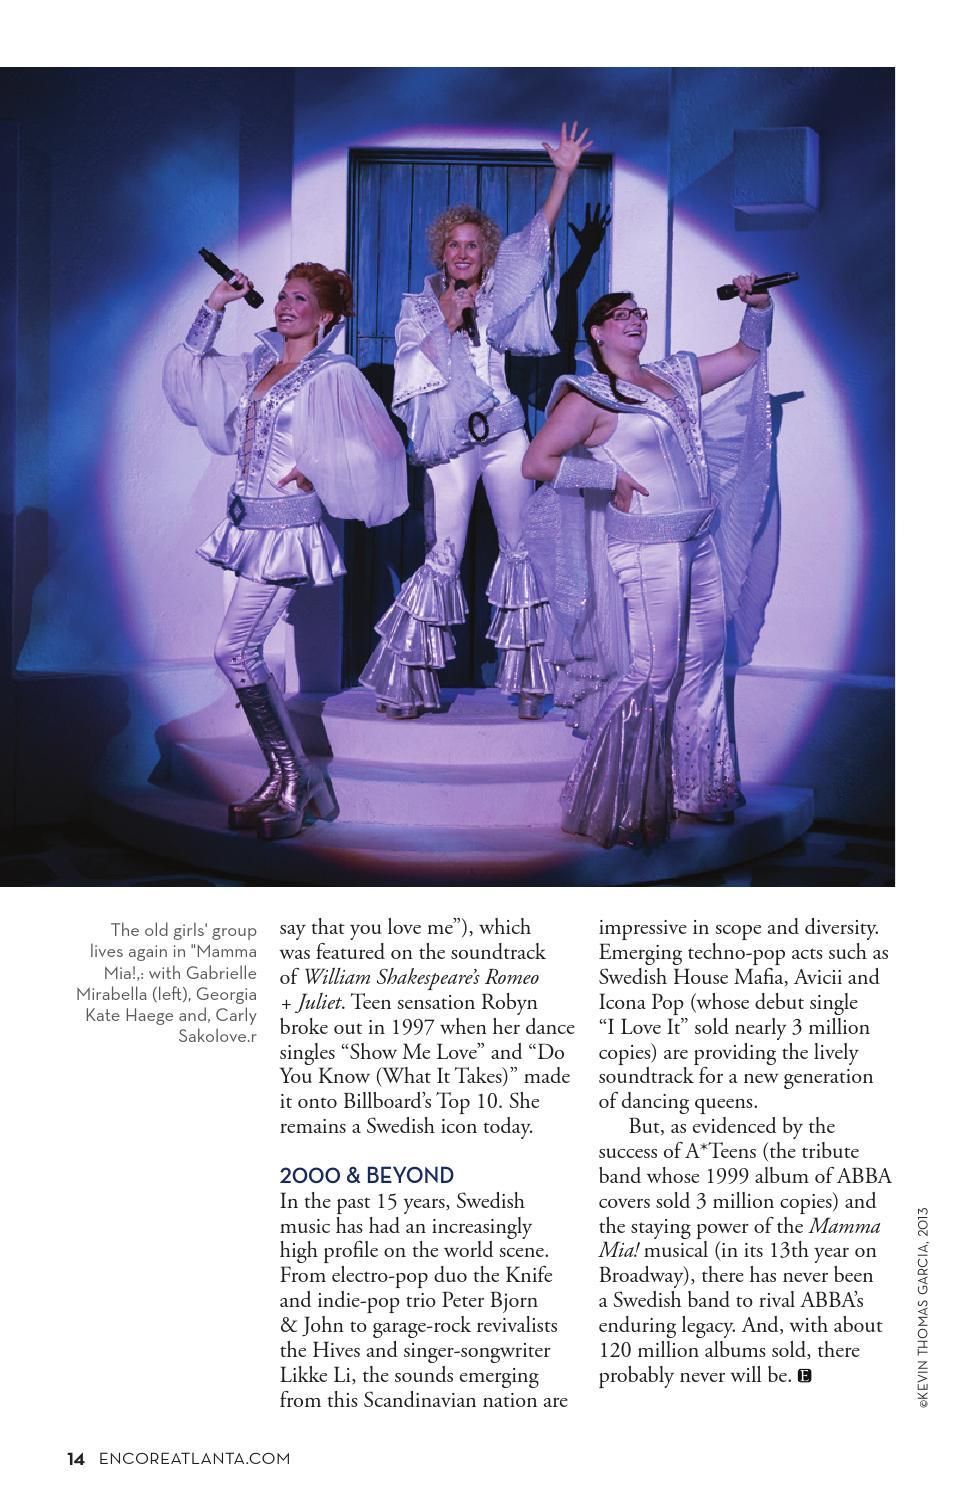 September 2014: Mamma Mia! at the Fox Theatre